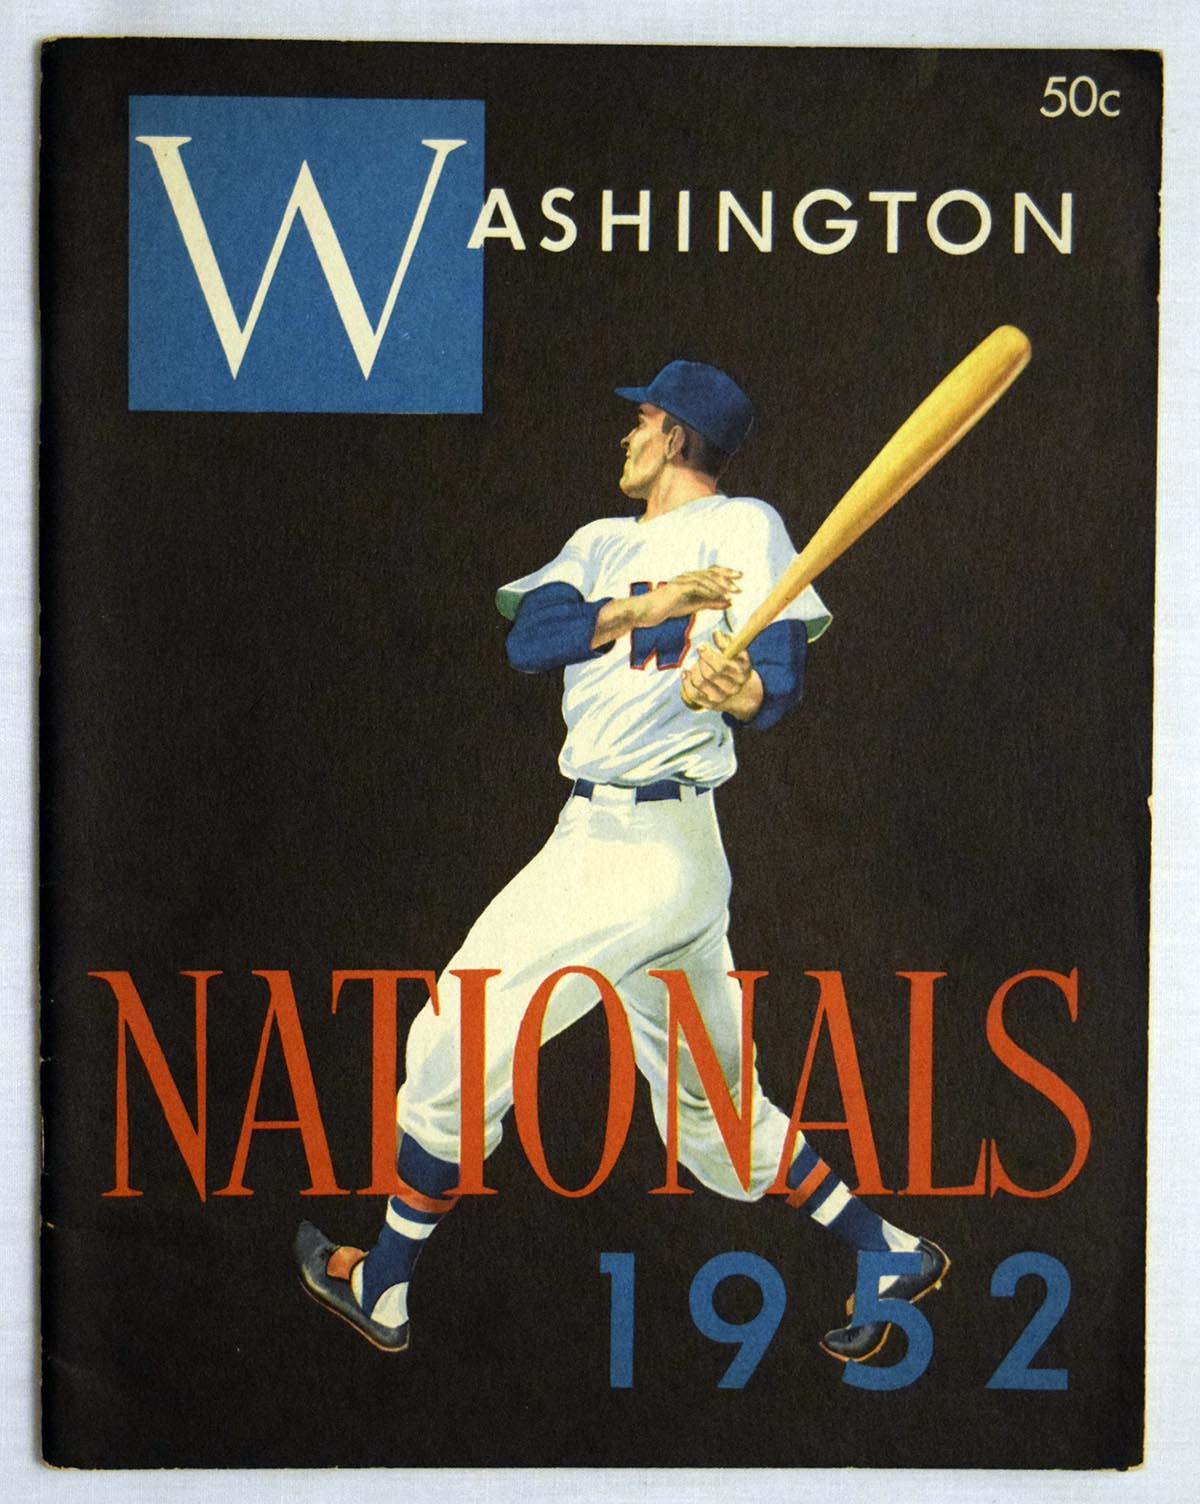 Lot #1408 1952 Yearbook  Washington Senators  Cond: Ex